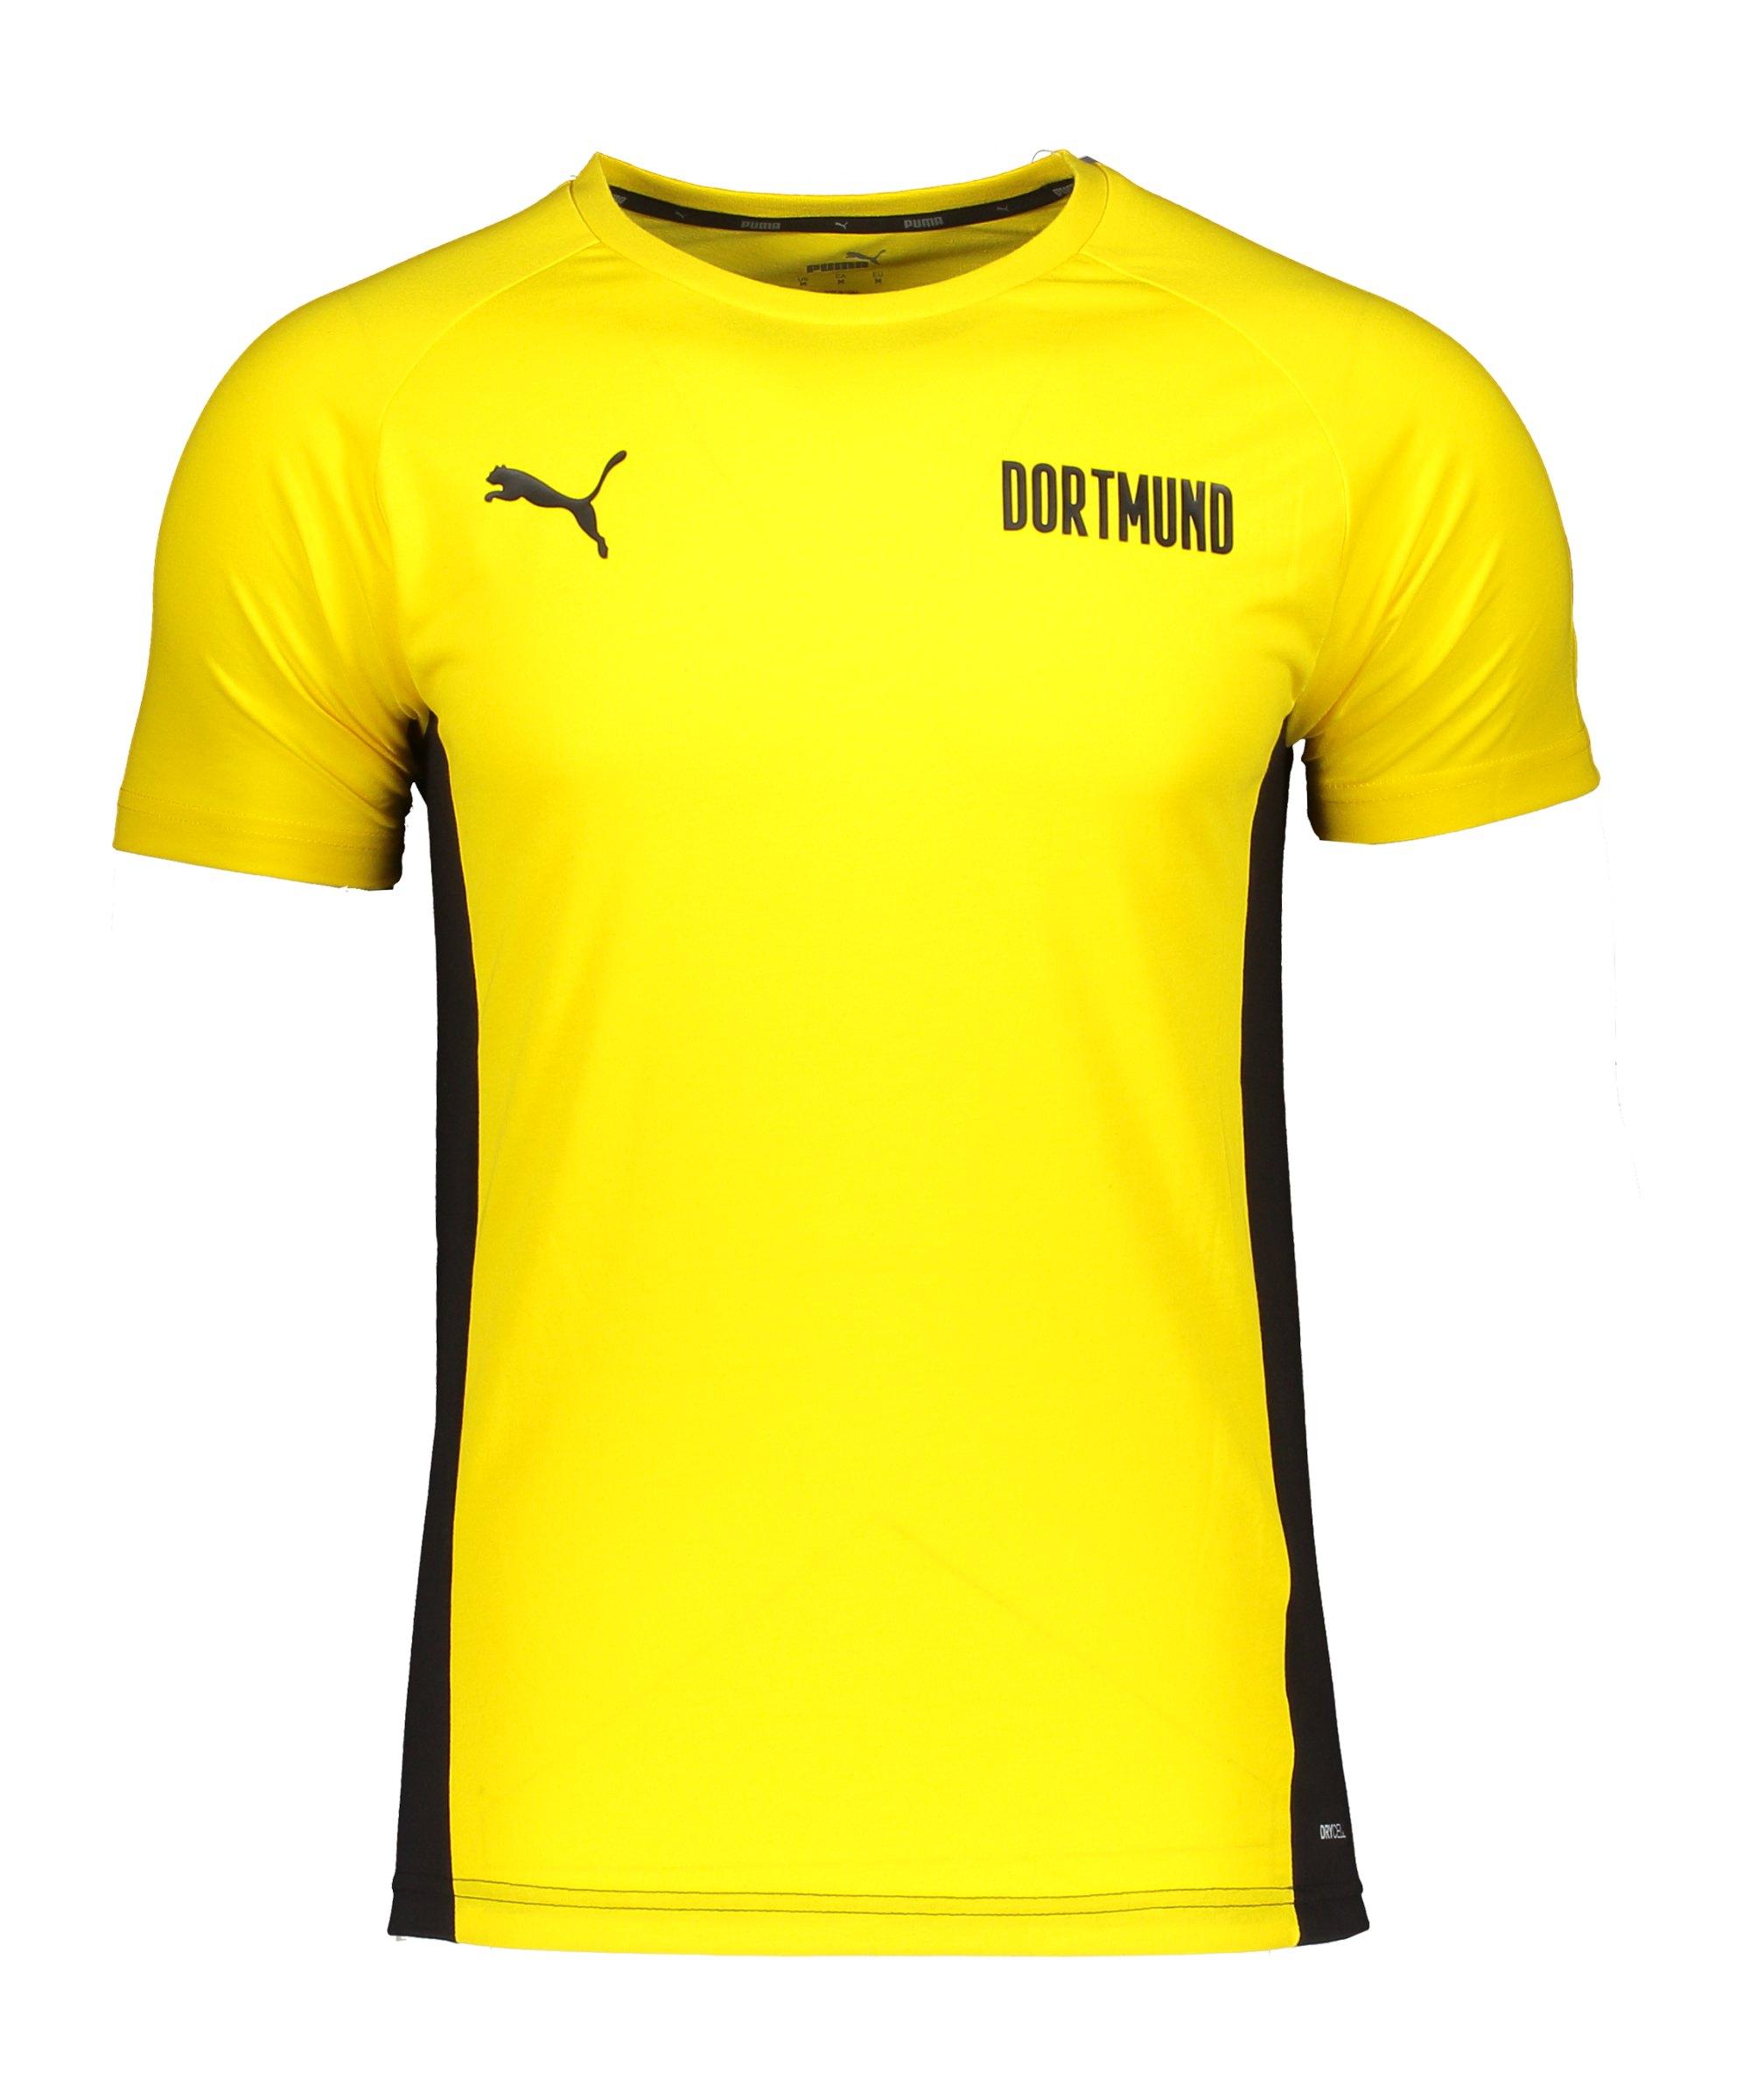 PUMA BVB Dortmund Evostripe T-Shirt Kids Gelb F01 - gelb